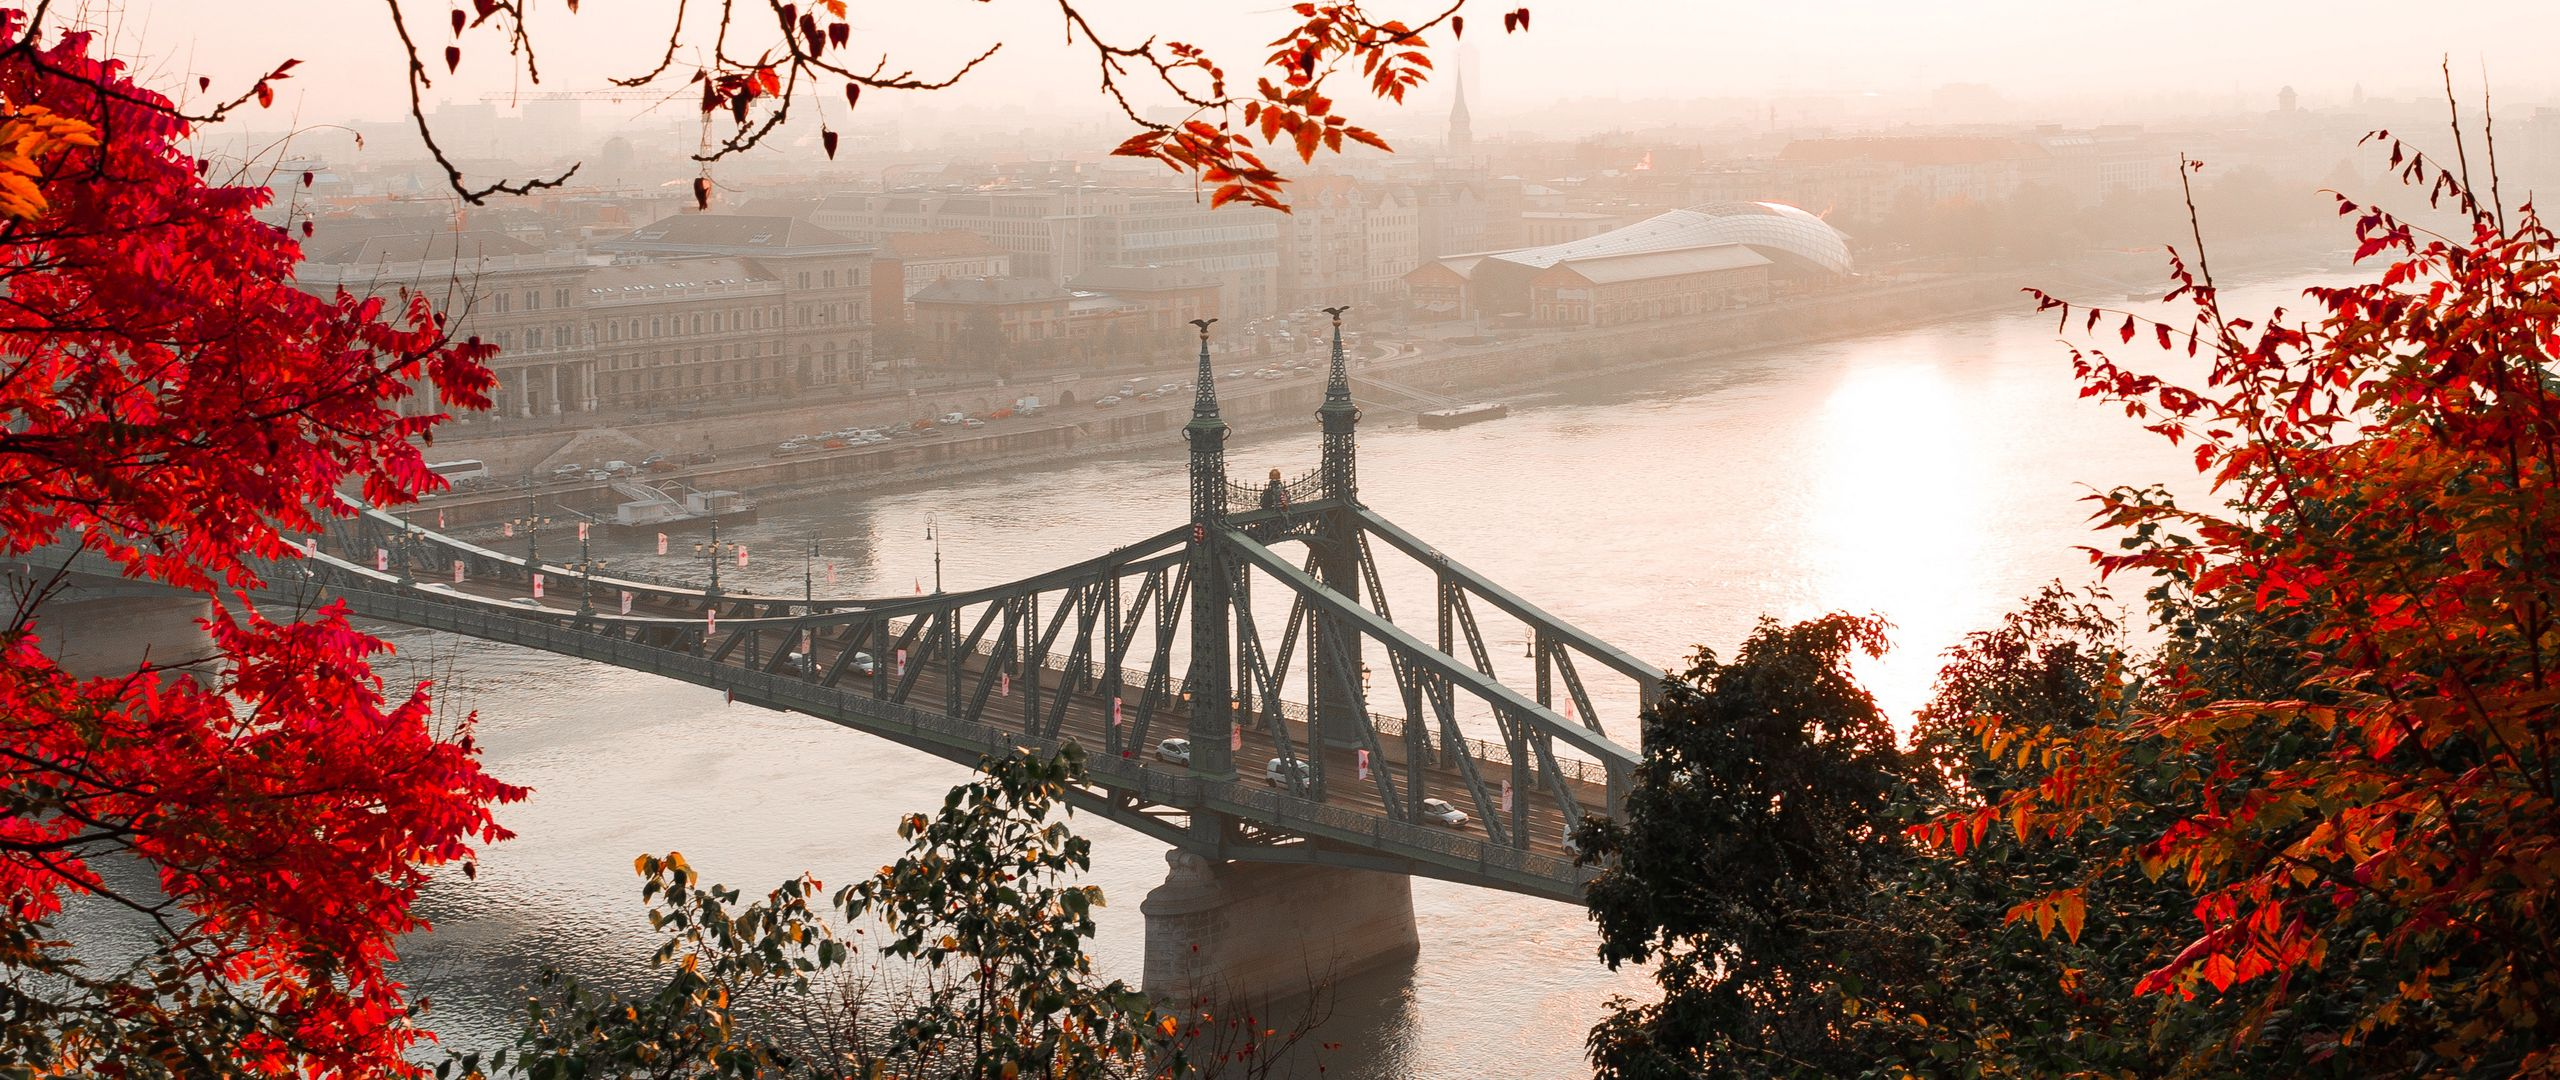 2560x1080 Wallpaper bridge, autumn, city, citadella, budapest, hungary